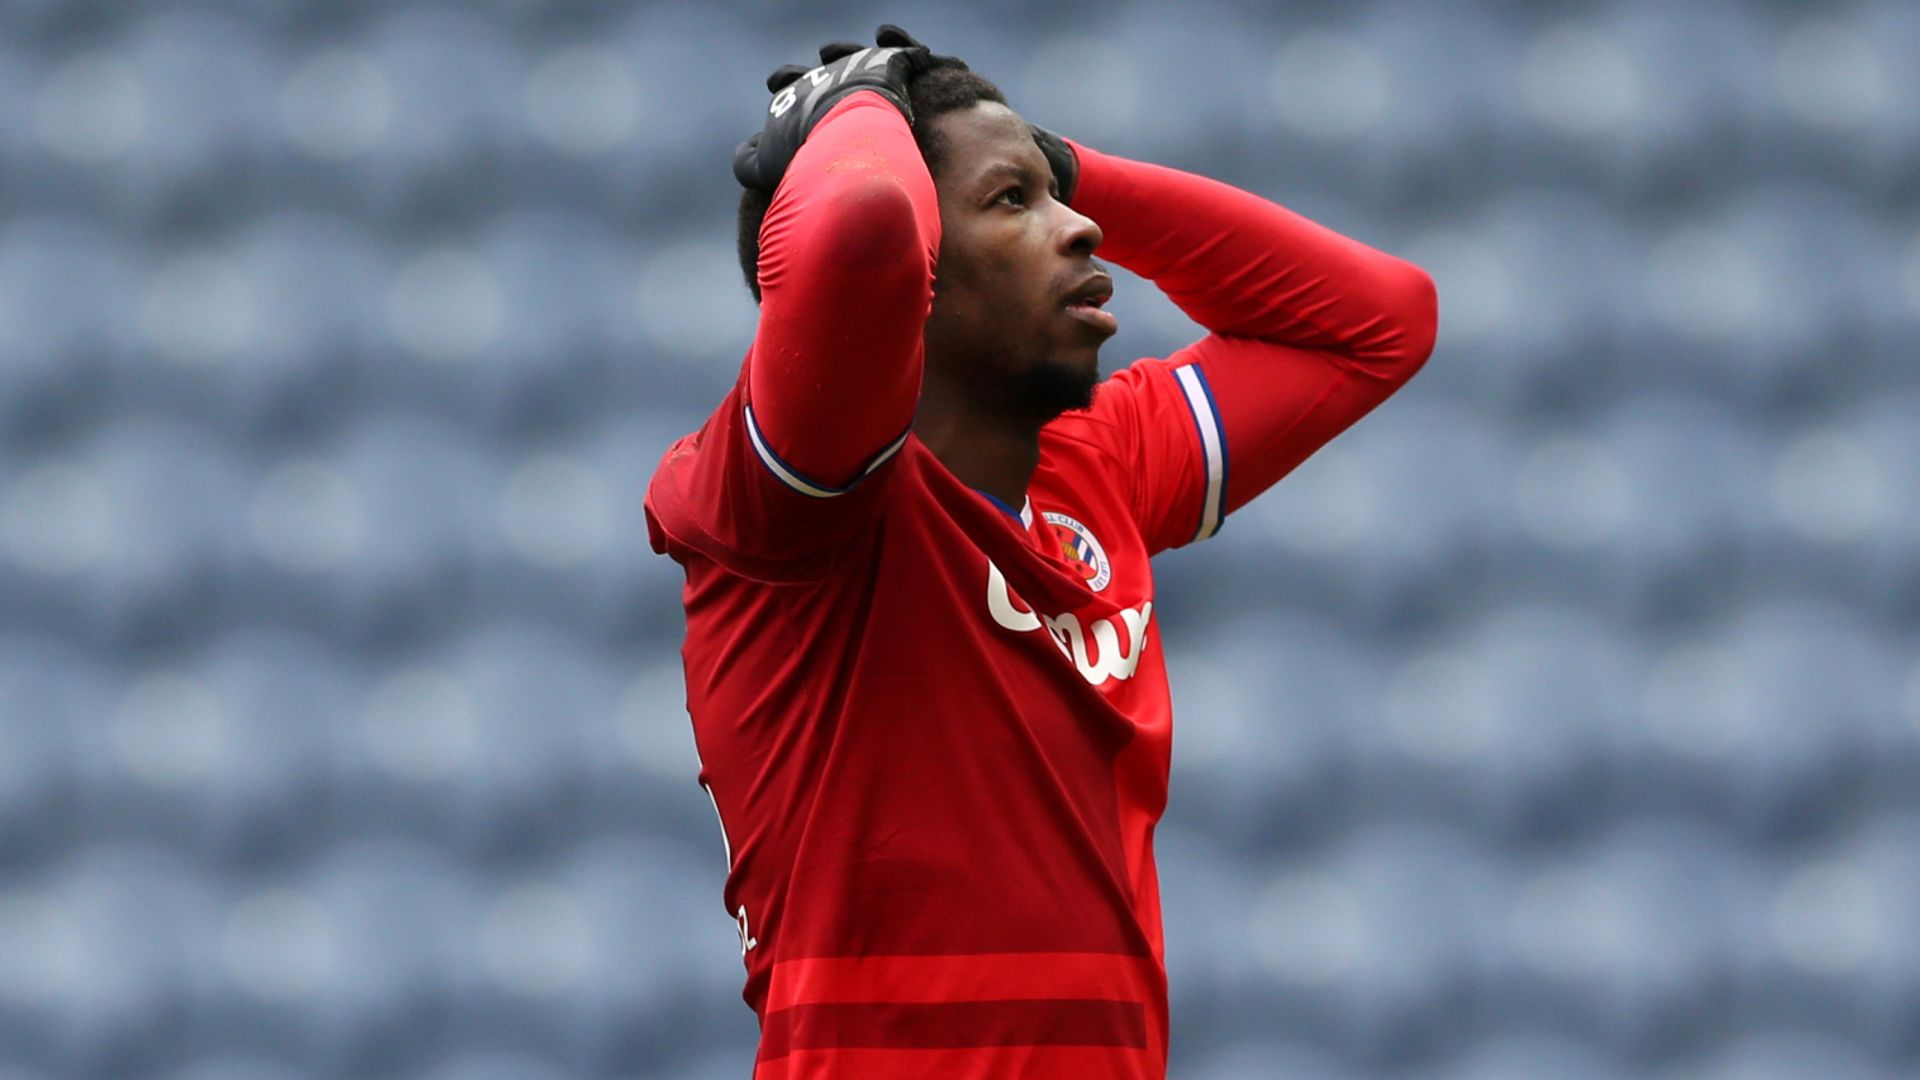 Joao misses penalty as Reading draw at Preston